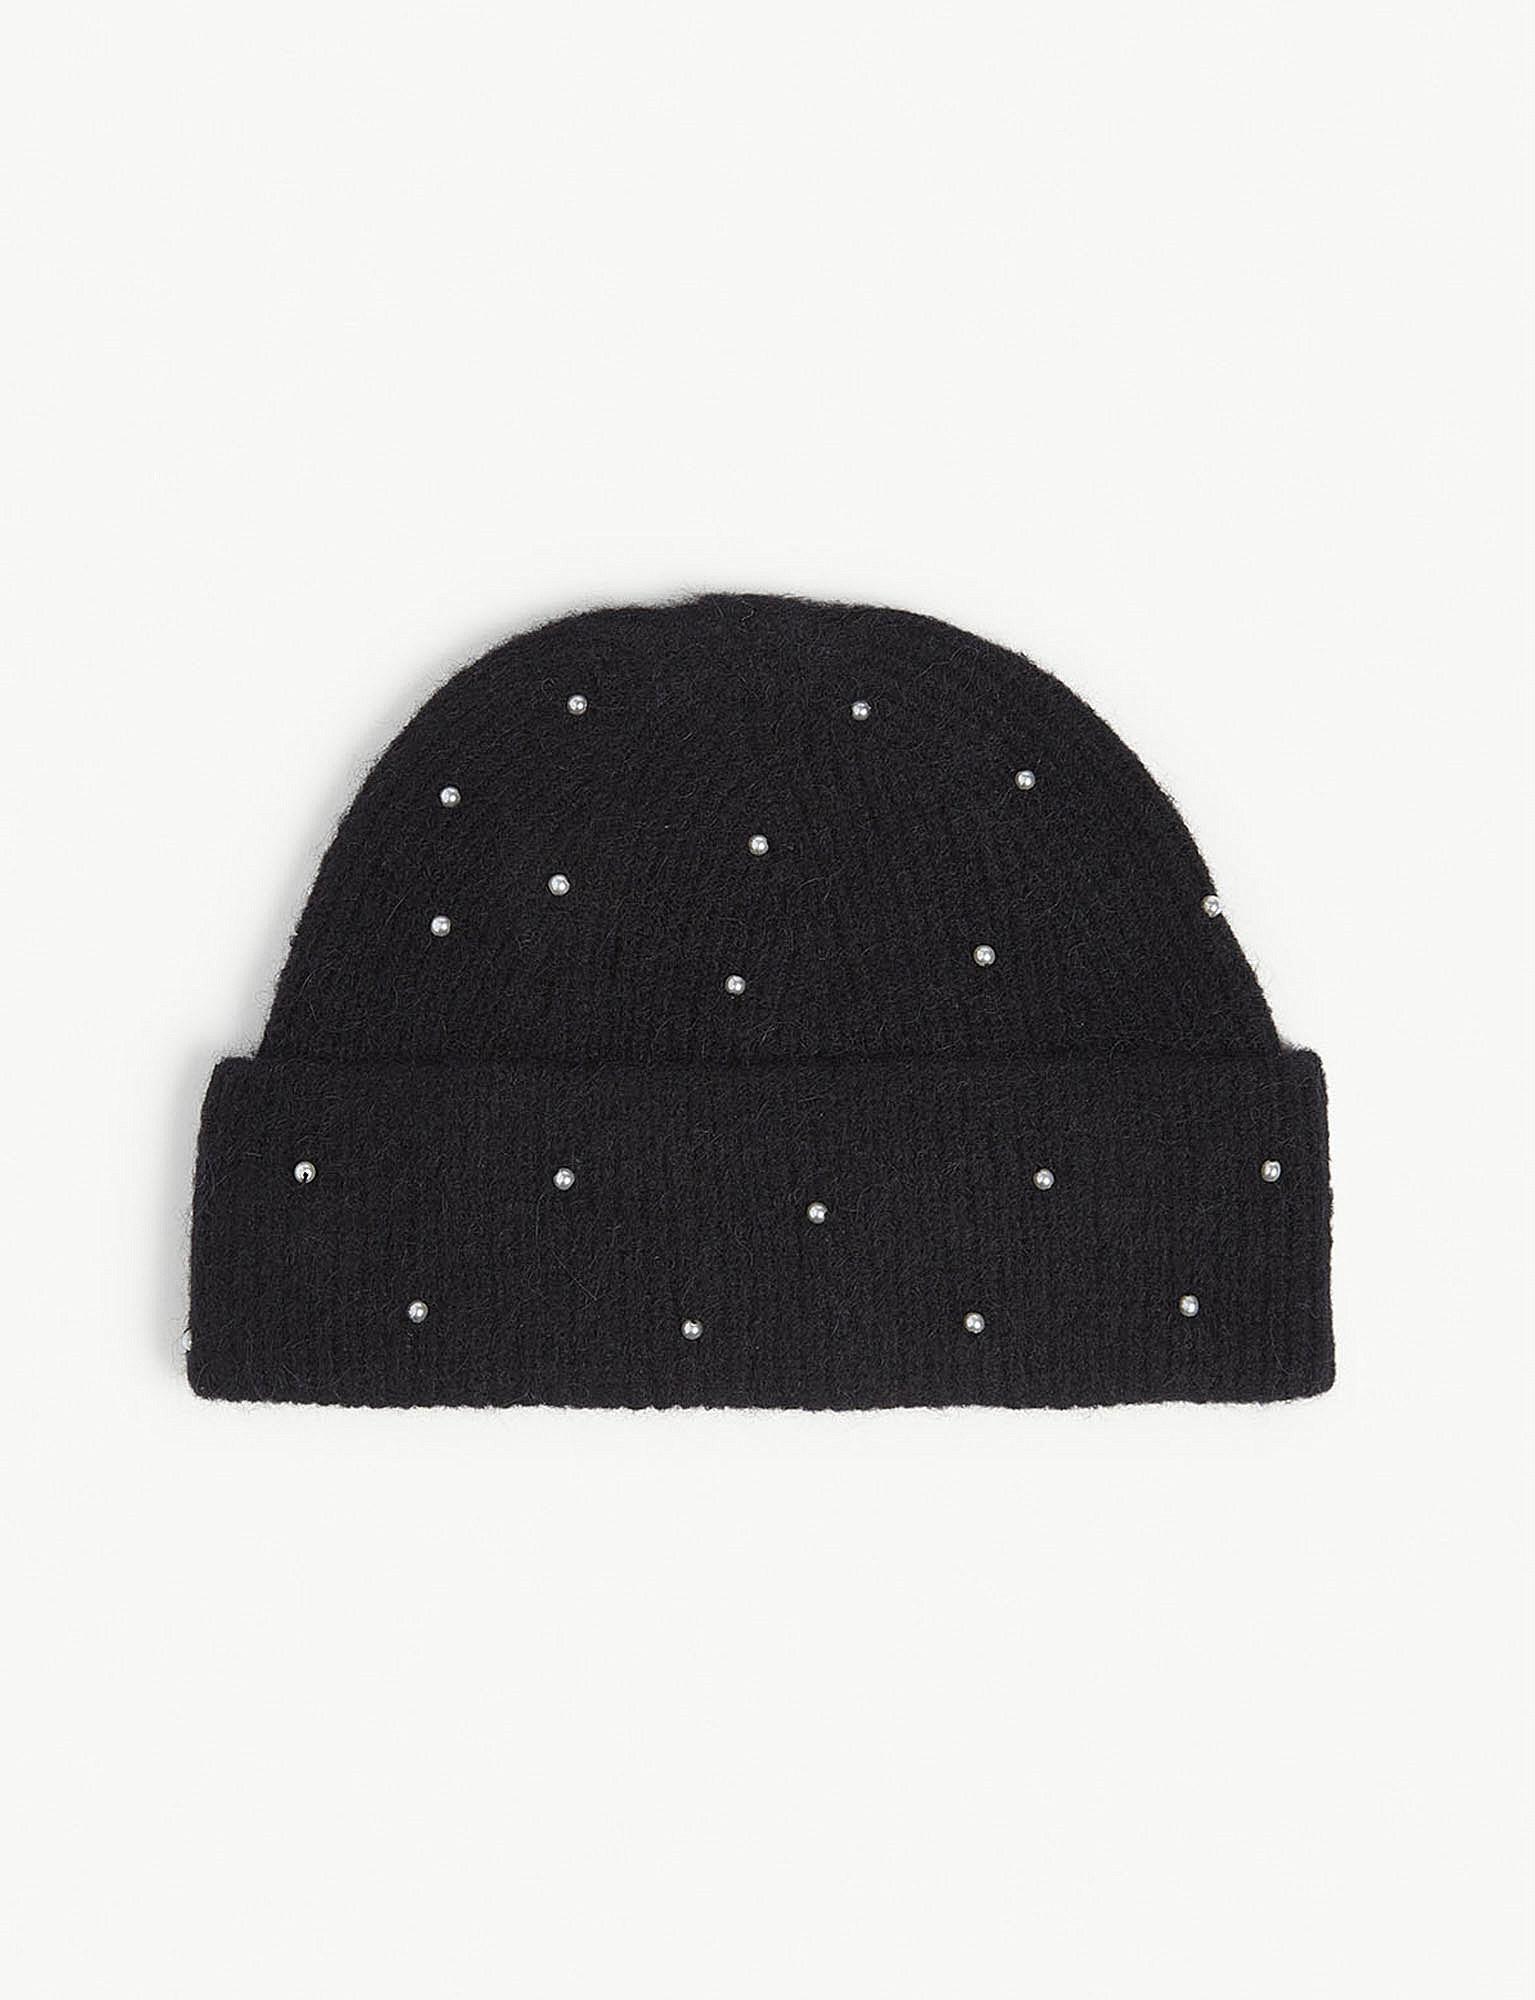 5e9e0fbbb2c Lyst - Sandro Pearl Wool-blend Beanie in Black - Save 65.6%